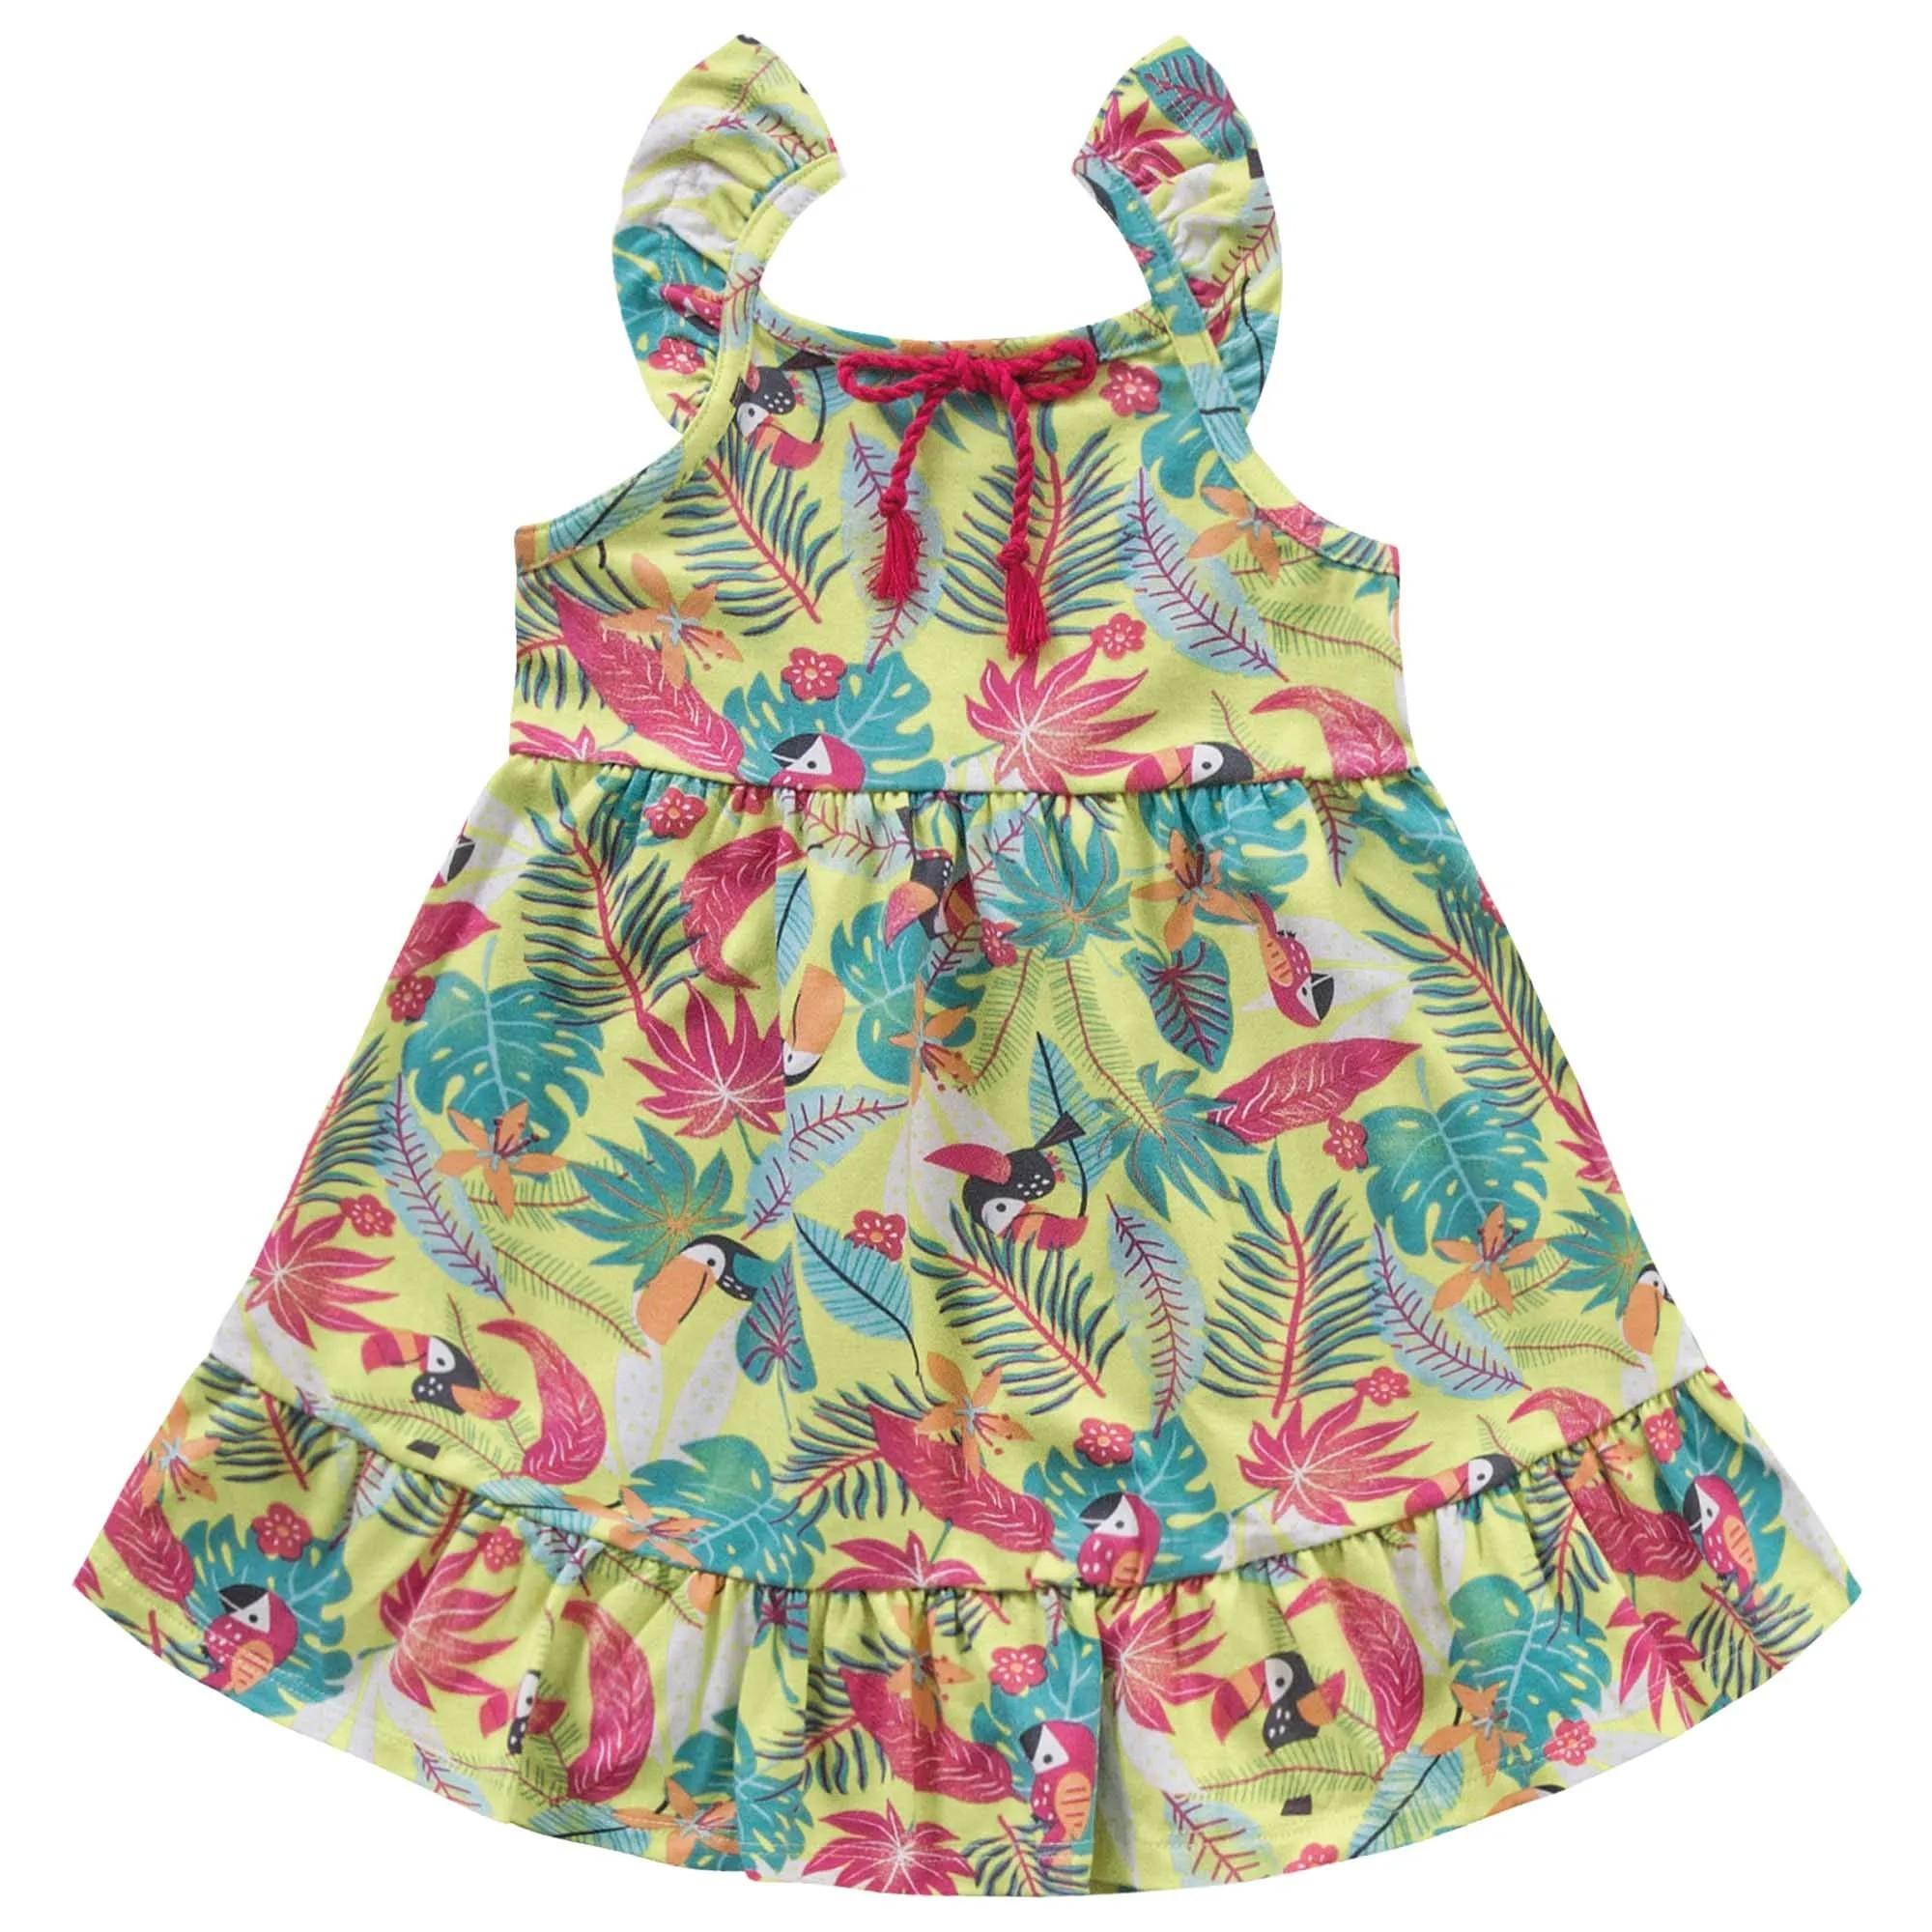 Vestido Verão Kiko e Kika Tropical - 1 ao 3